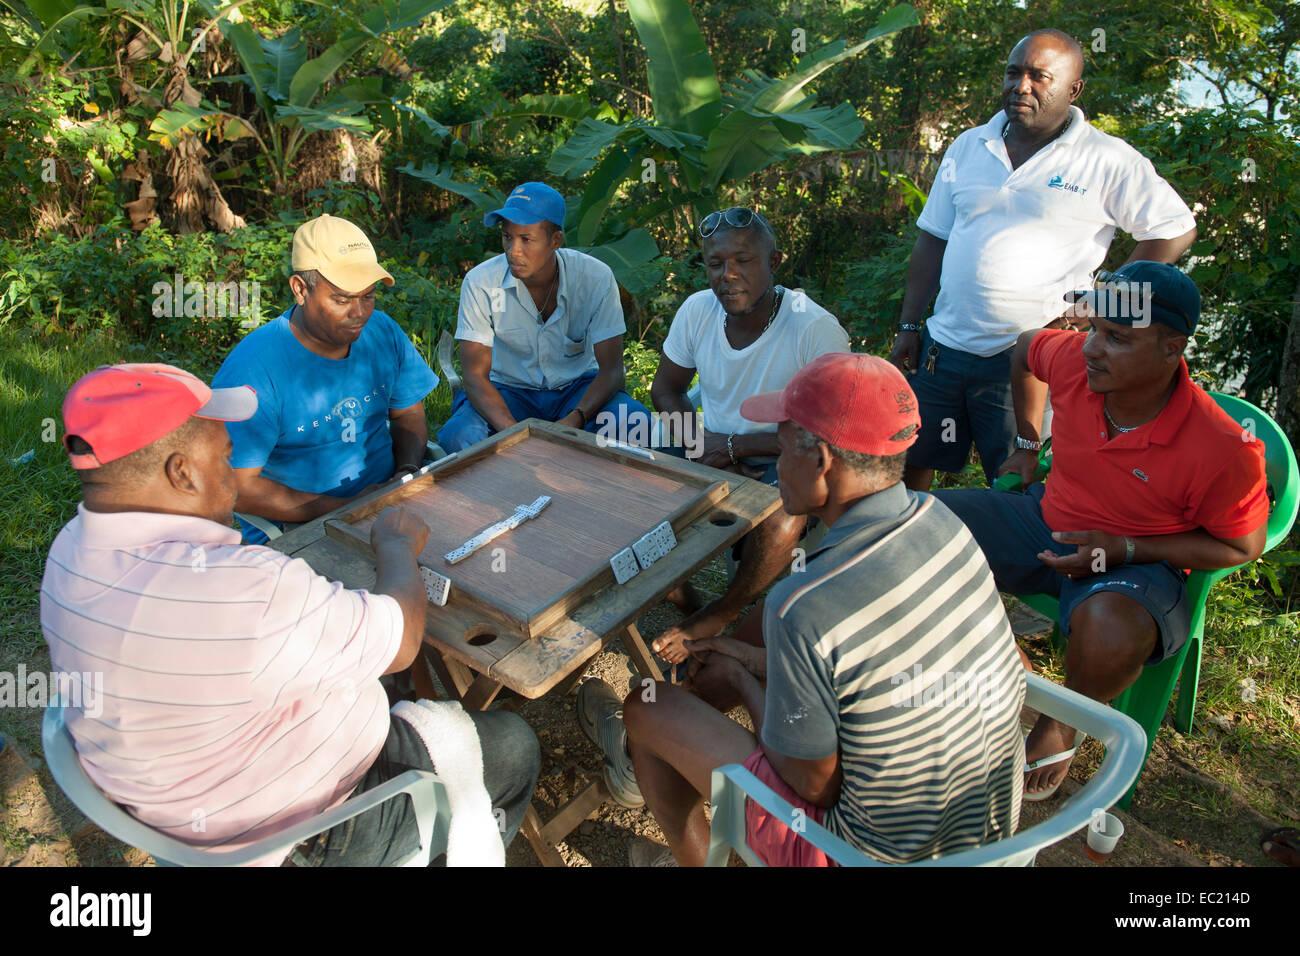 Dominikanische Republik, Halbinsel Samana, Santa Barbara de Samana, Männer spielen Domino - Stock Image